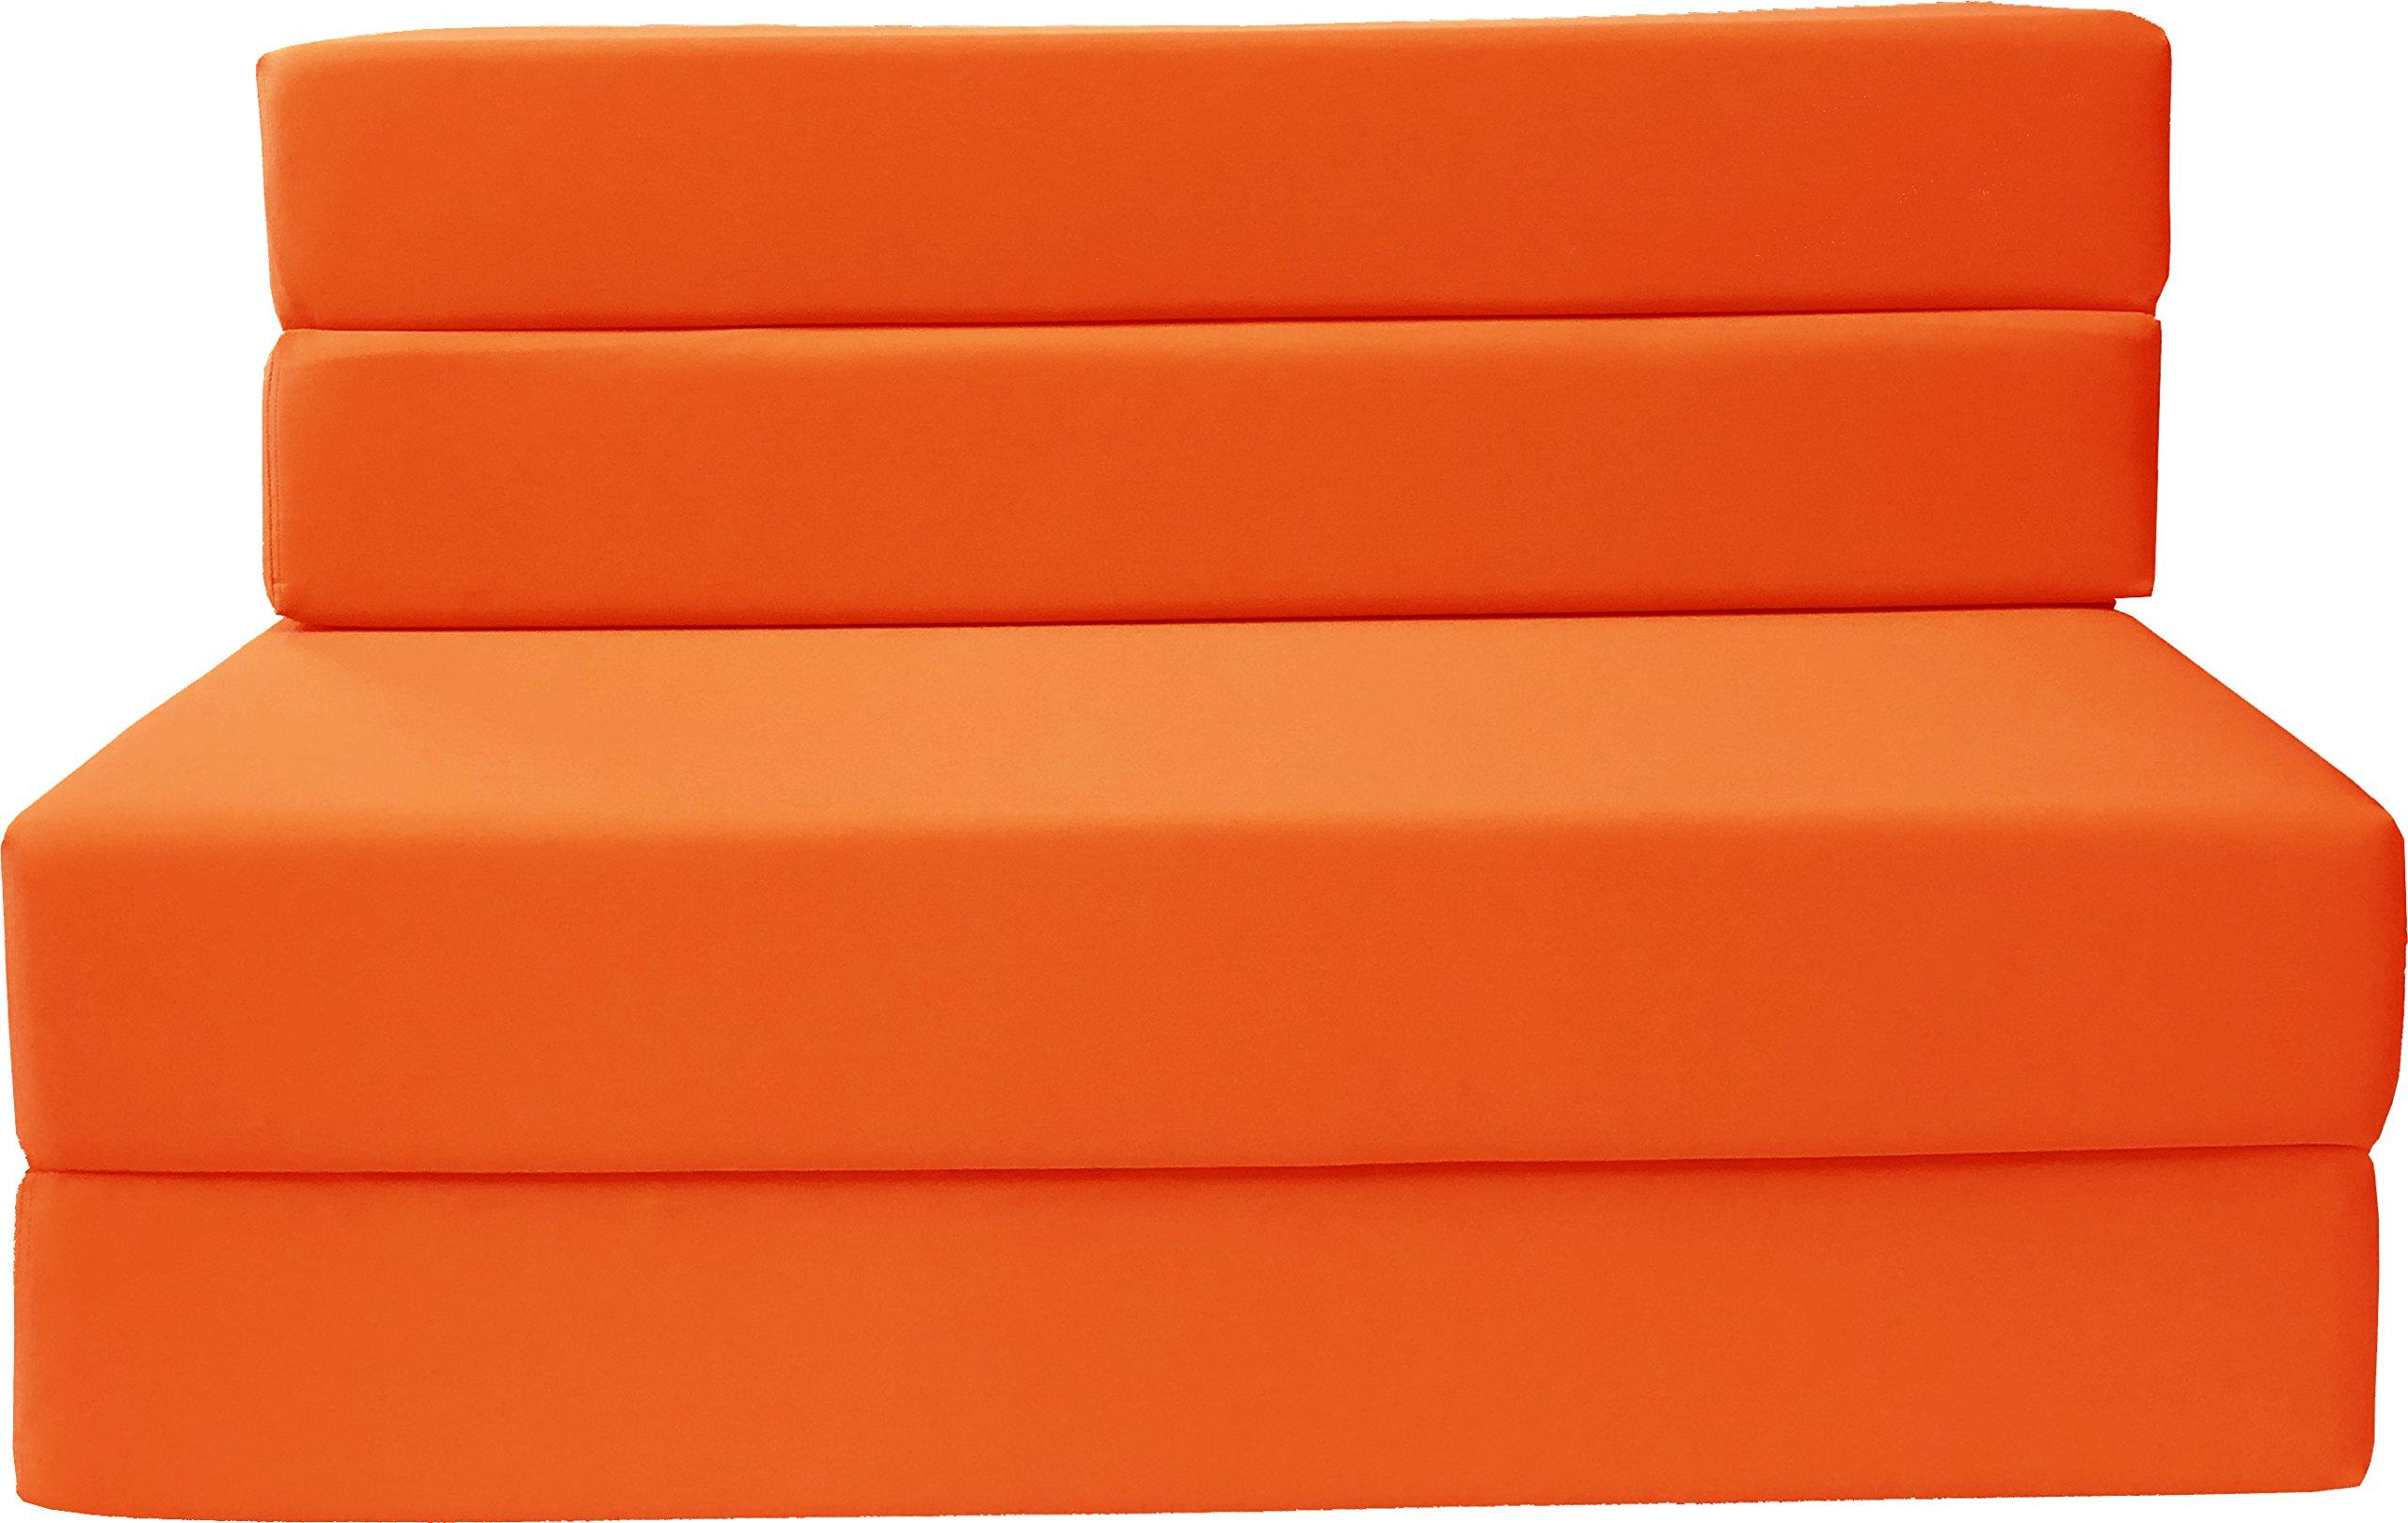 Folding Foam Mattress, Sofa Chair Bed, Guest Beds (Twin Size, Orange)